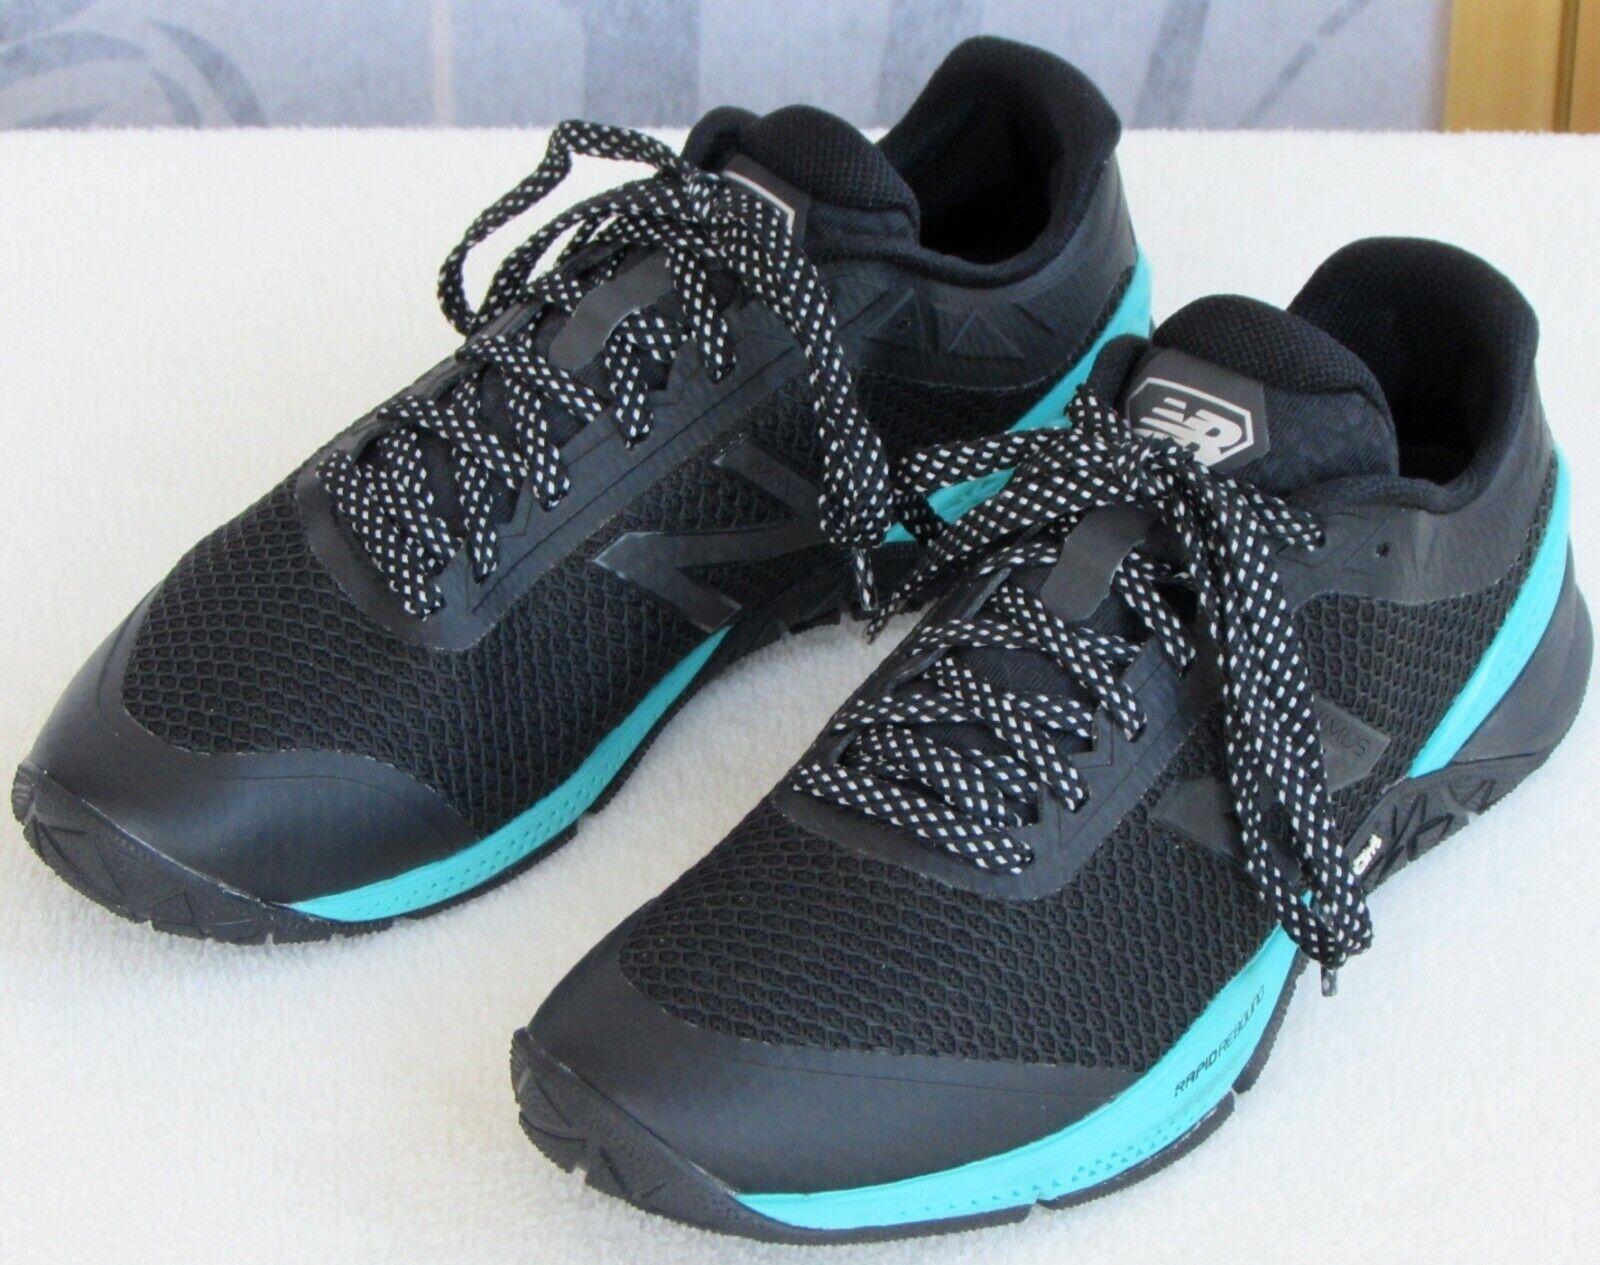 10   New Balance Mimimus Women Black Aqua Vibram Sole Running Sneaker shoes